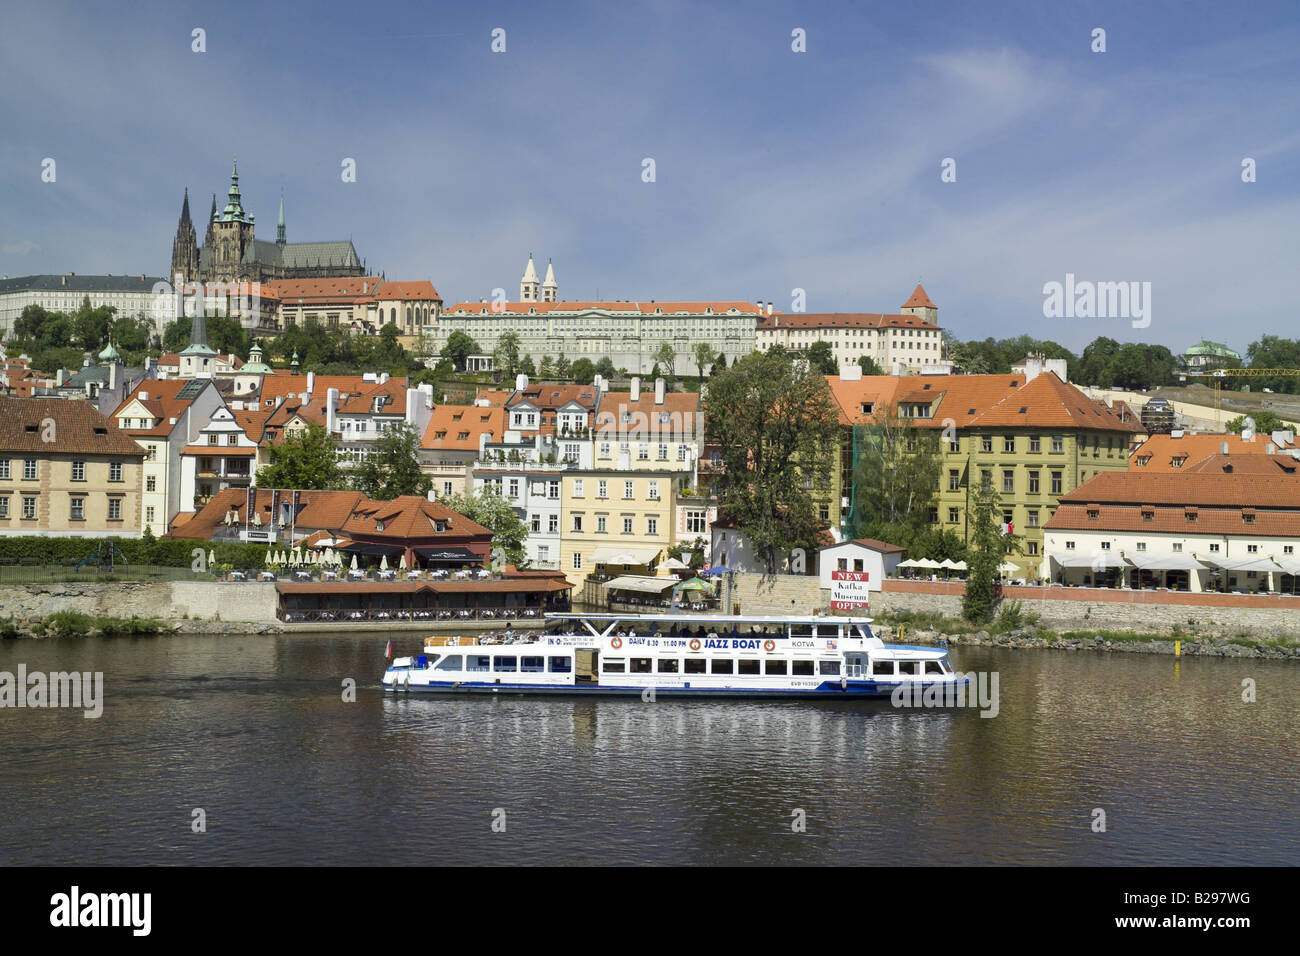 River Vltava Prague Ref WP TARU 000728 015 Date COMPULSORY CREDIT World Pictures Photoshot - Stock Image